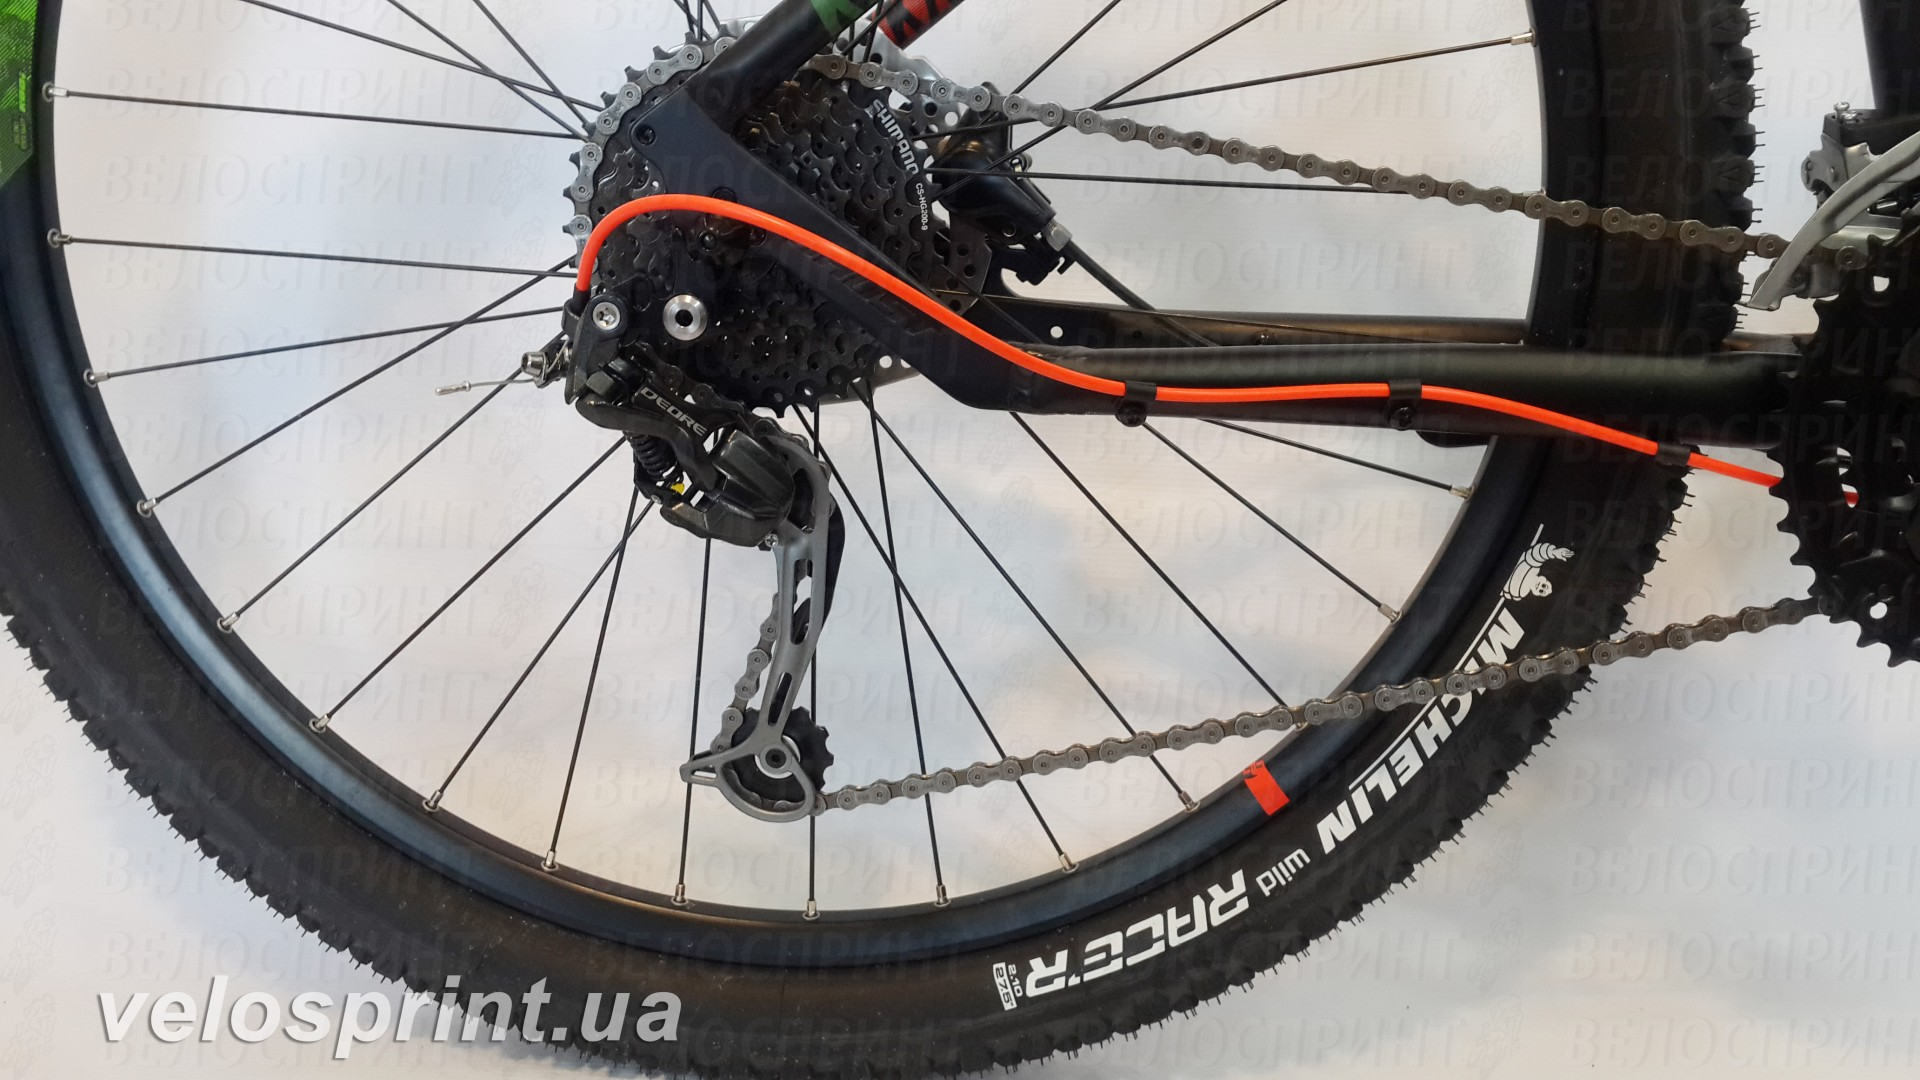 Велосипед GHOST Kato 3 AL 27.5 nightblack/riotgreen/neonred задний переключатель год 2017